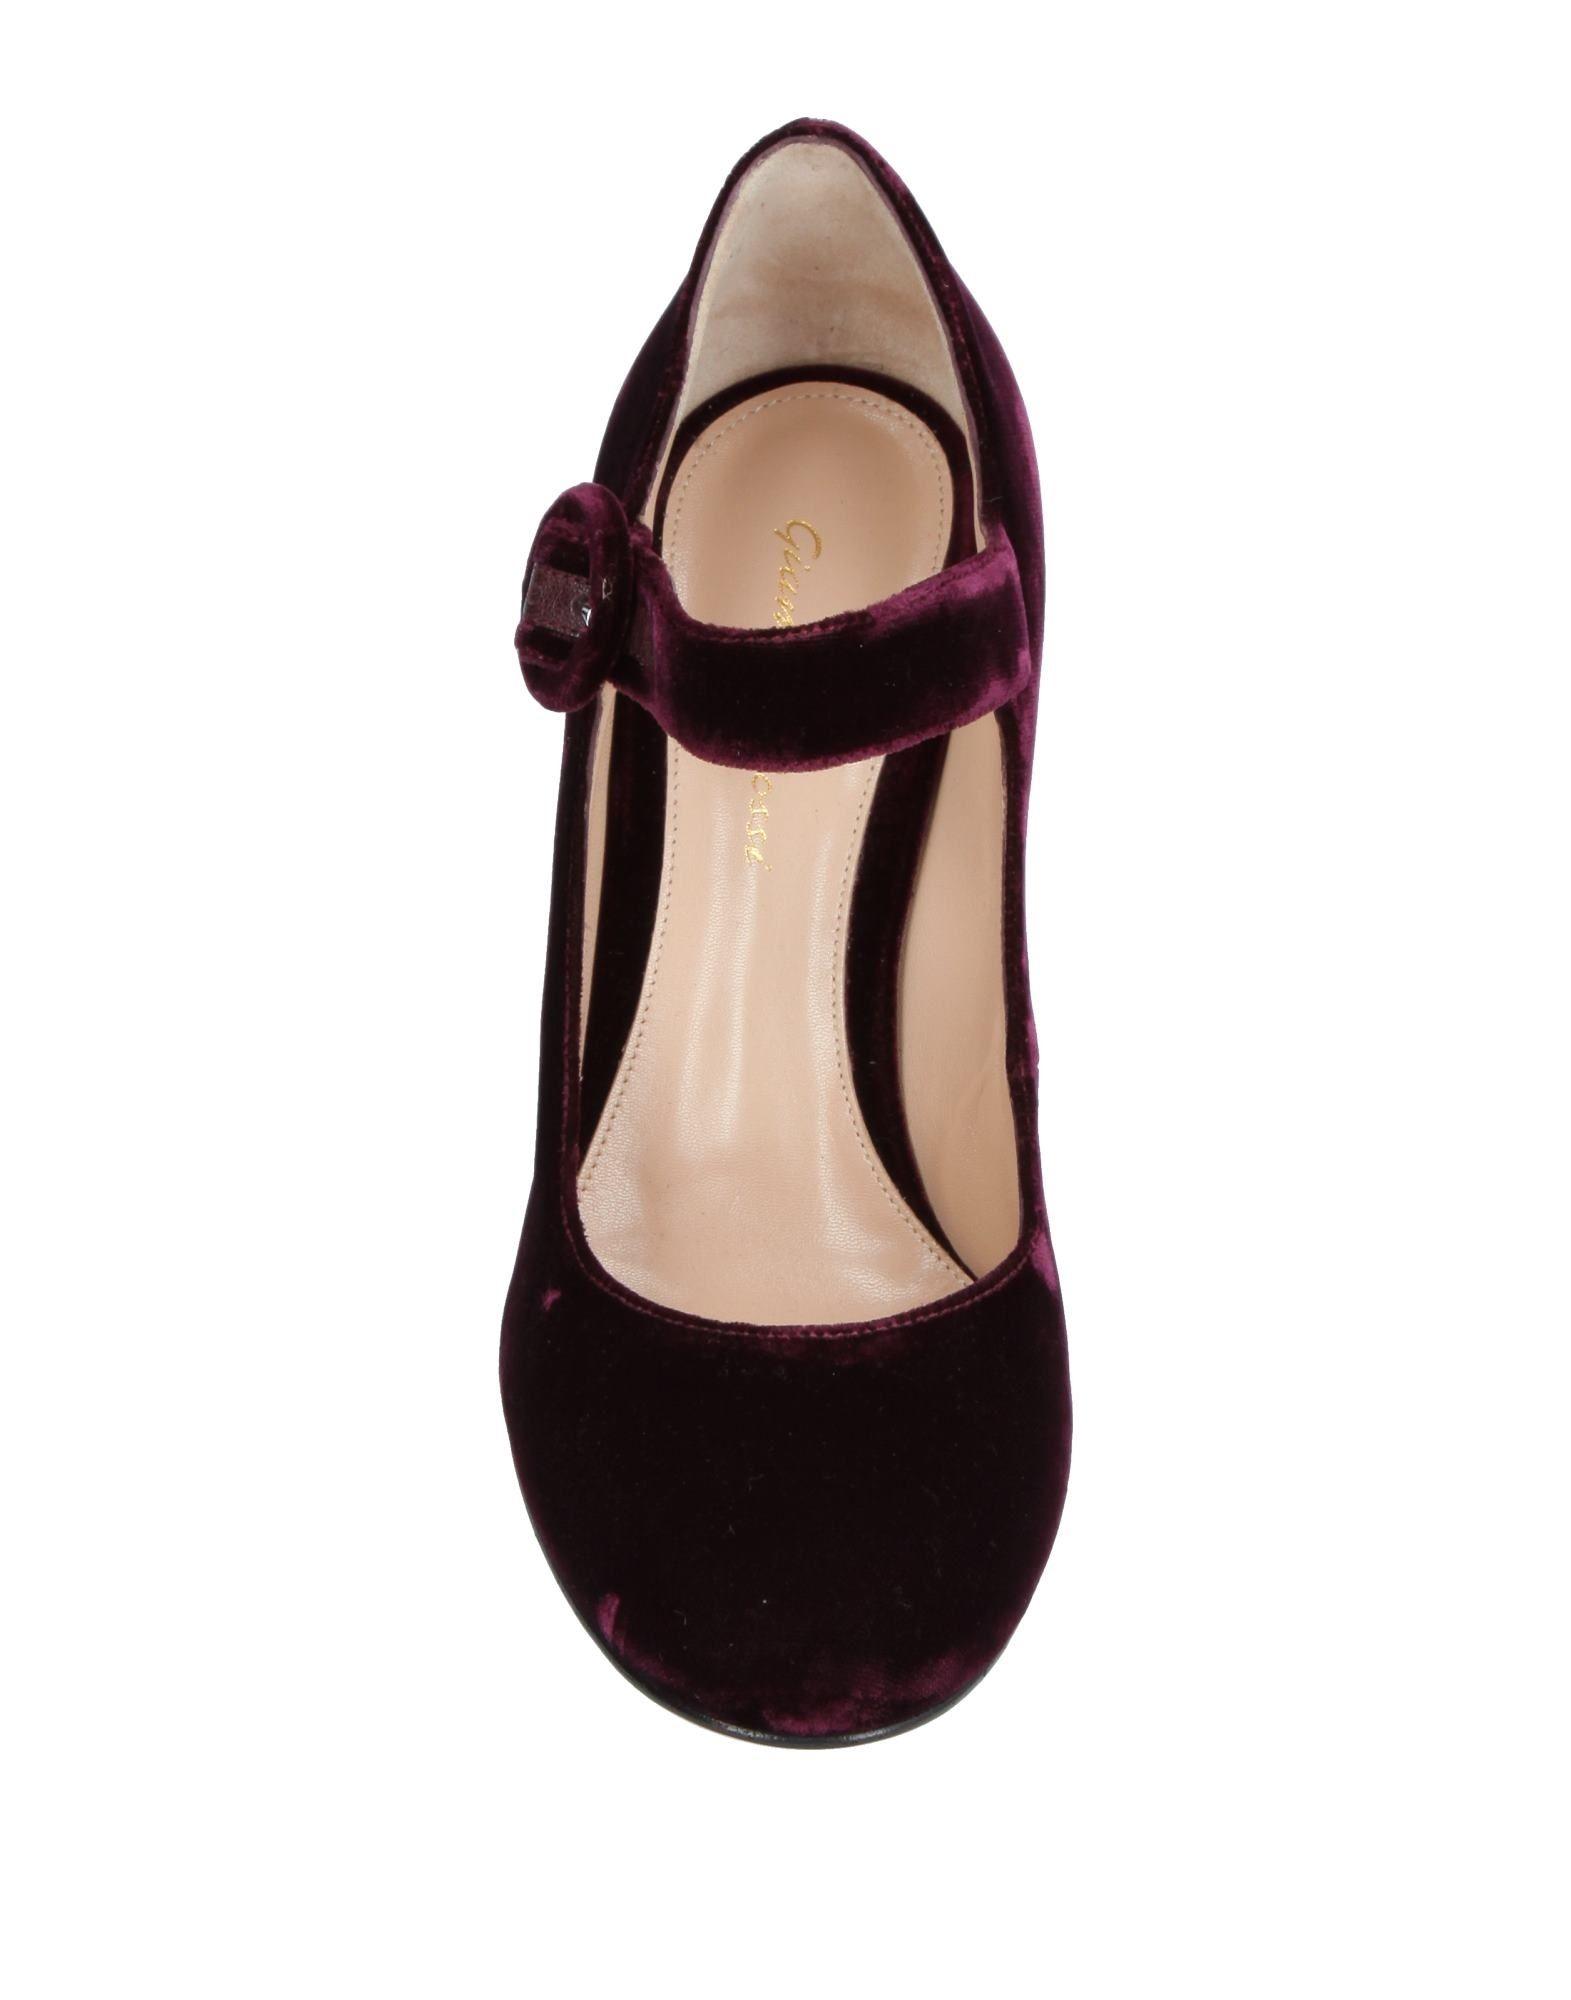 Rabatt Damen Schuhe Gianvito Rossi Pumps Damen Rabatt  11210992AB 9774ac